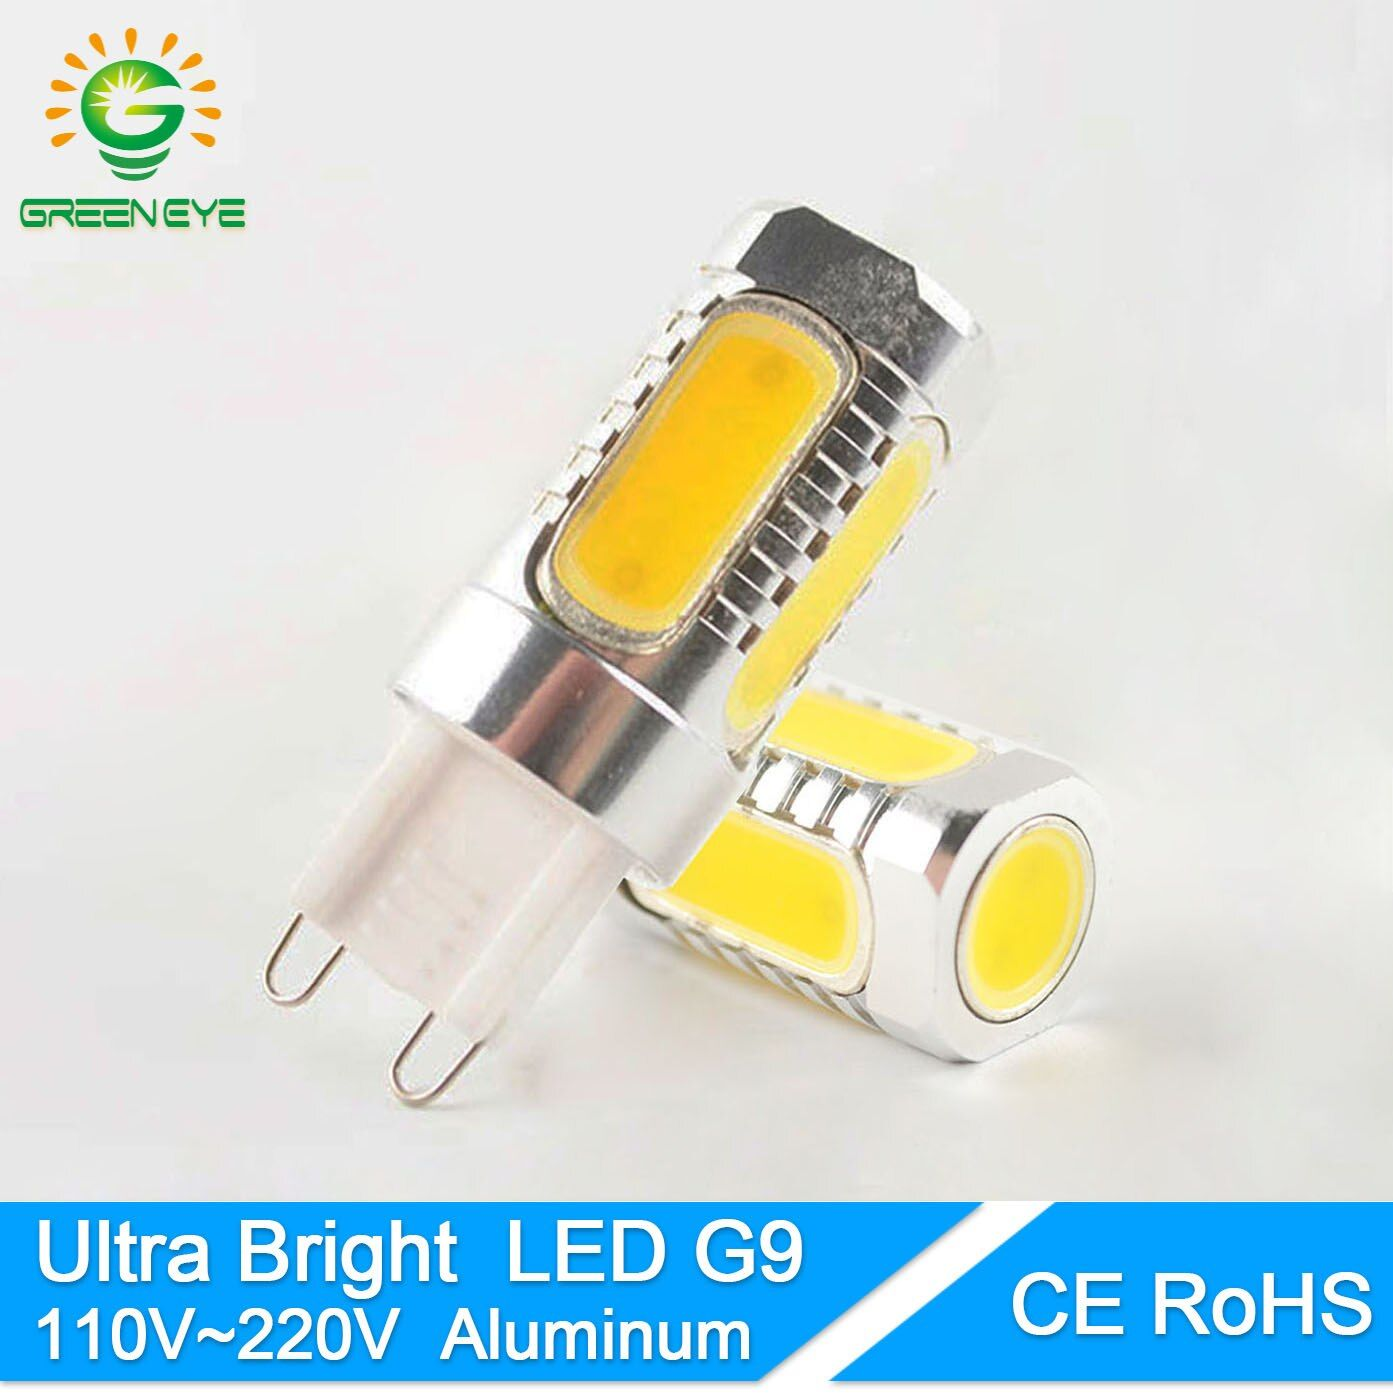 GreenEye Aluminium G9 LED-Licht 12 Watt 110 V 220 V COB LED G9 Lampe Kristall Mais-birnen-droplight Kronleuchter scheinwerfer Ersetzen Halogen